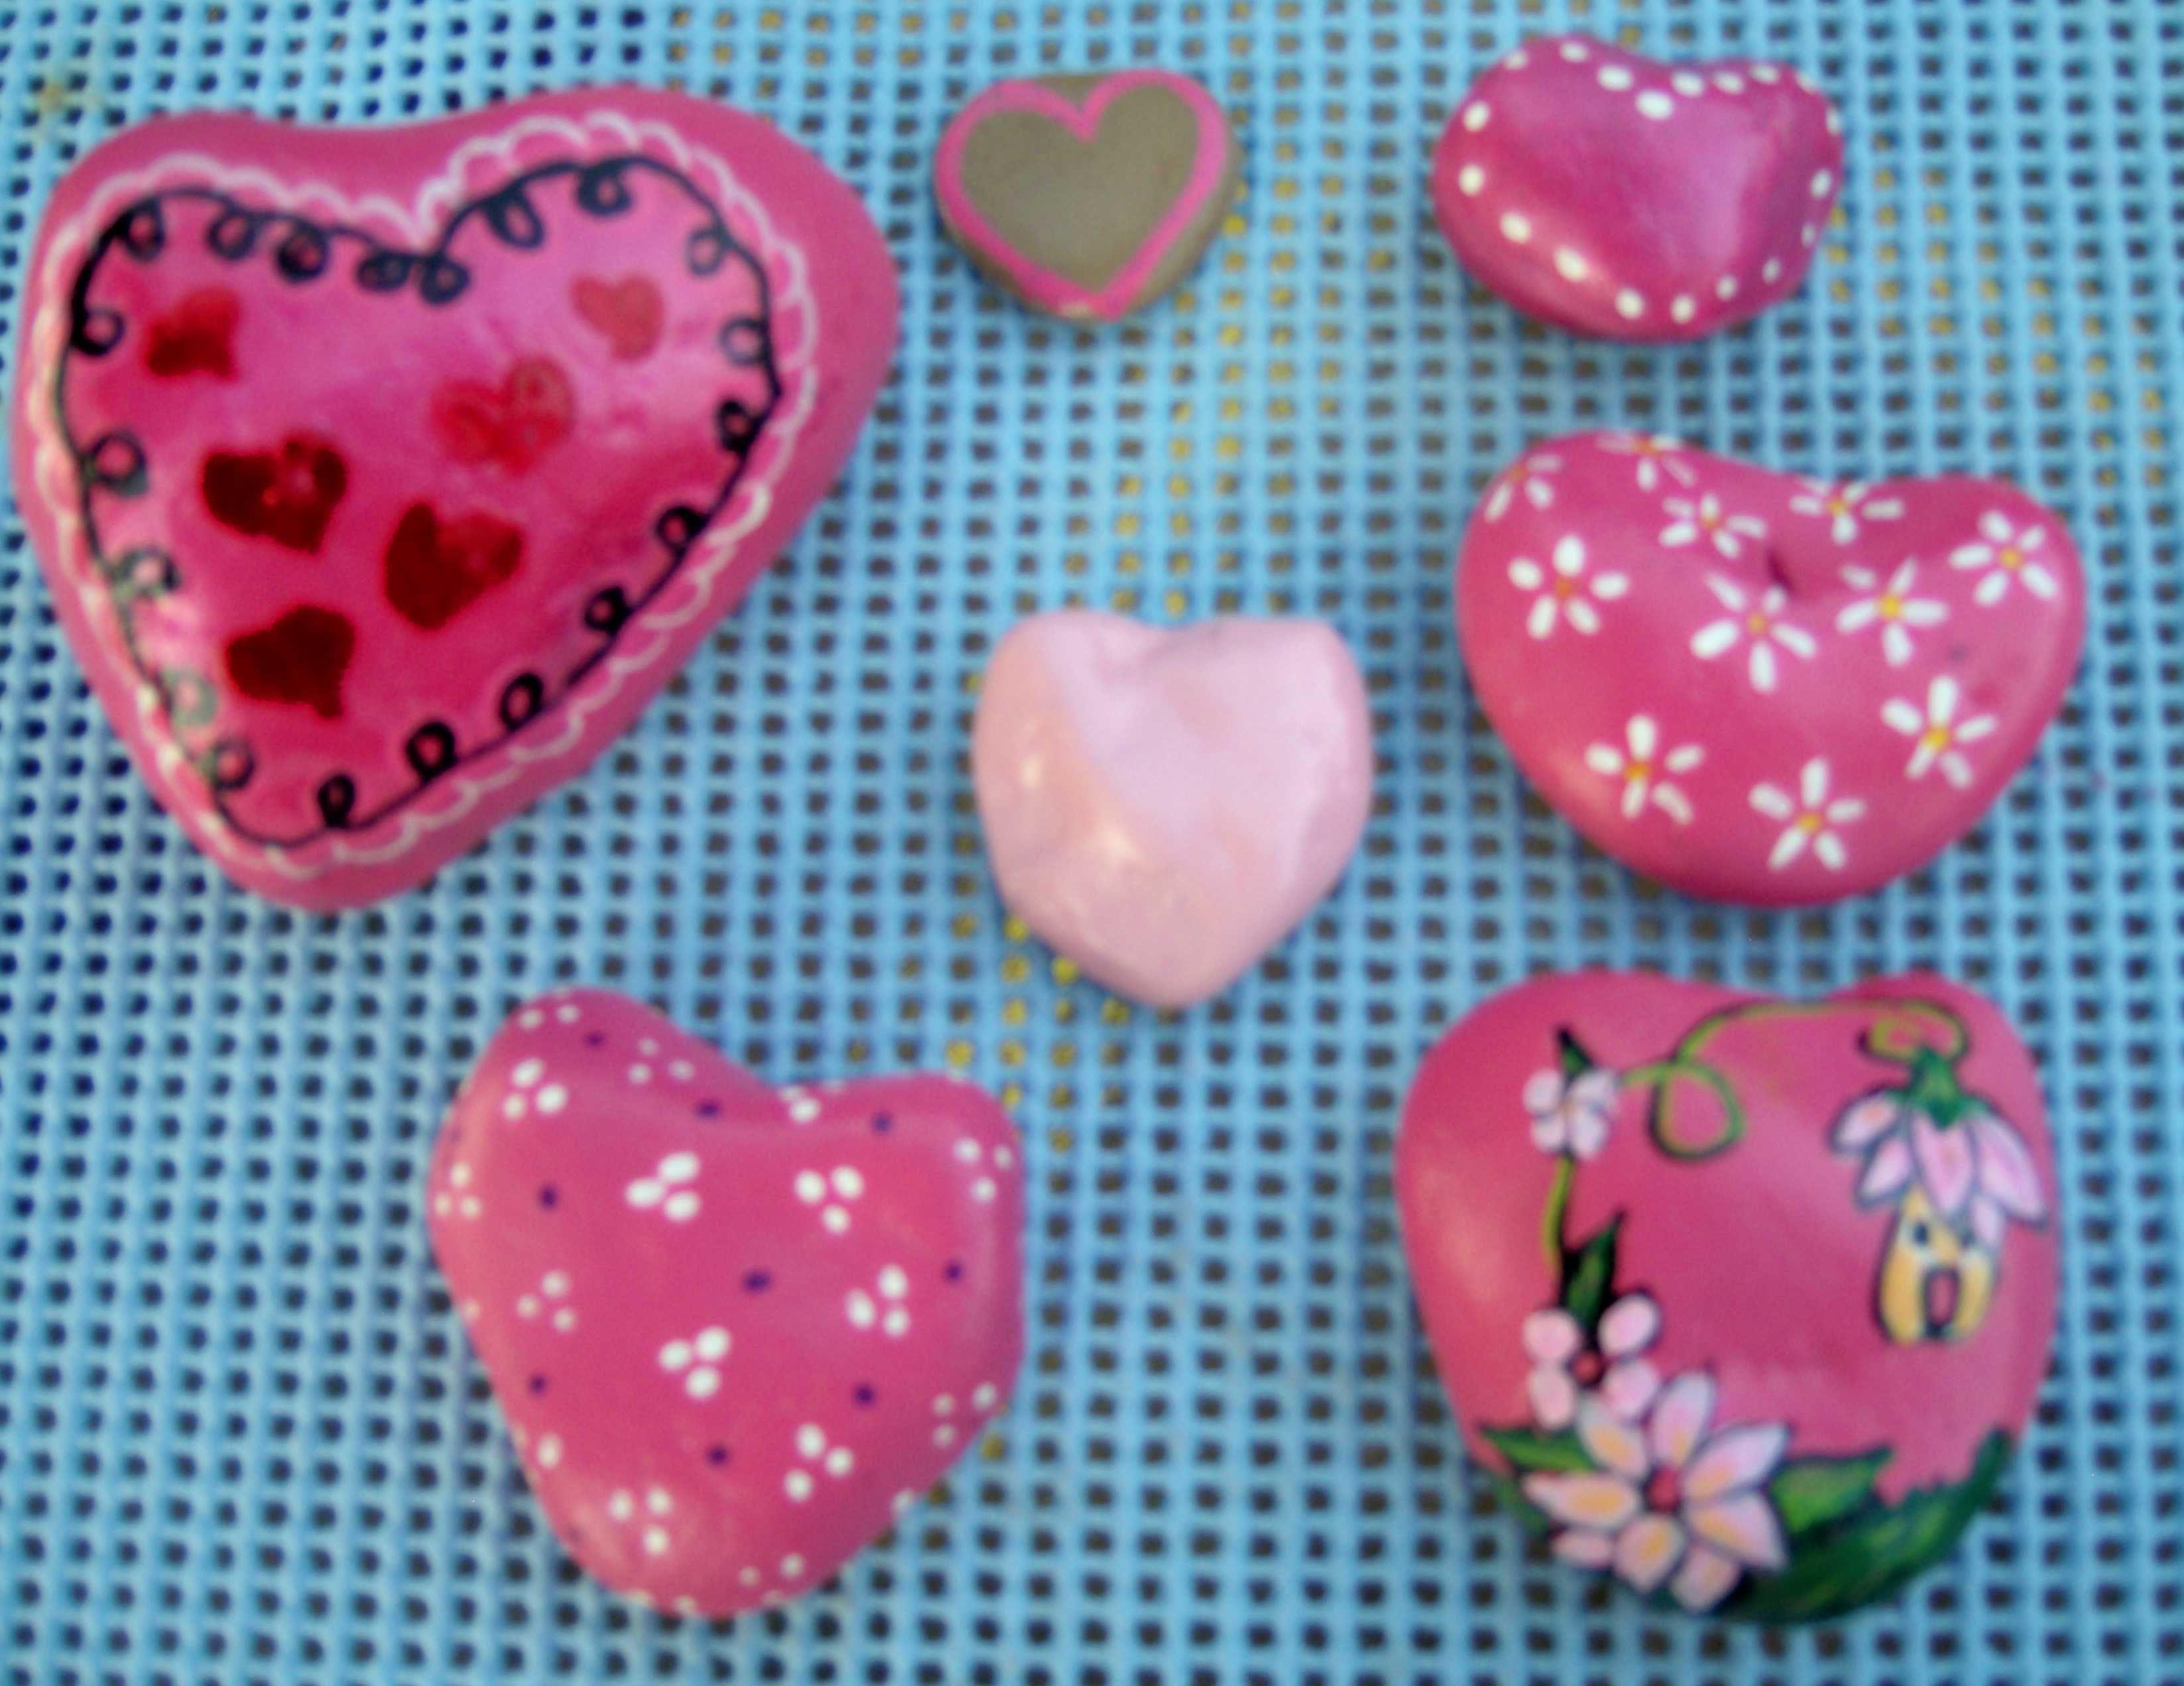 90 best Heart Shaped Rocks images on Pinterest | Painted rocks ...